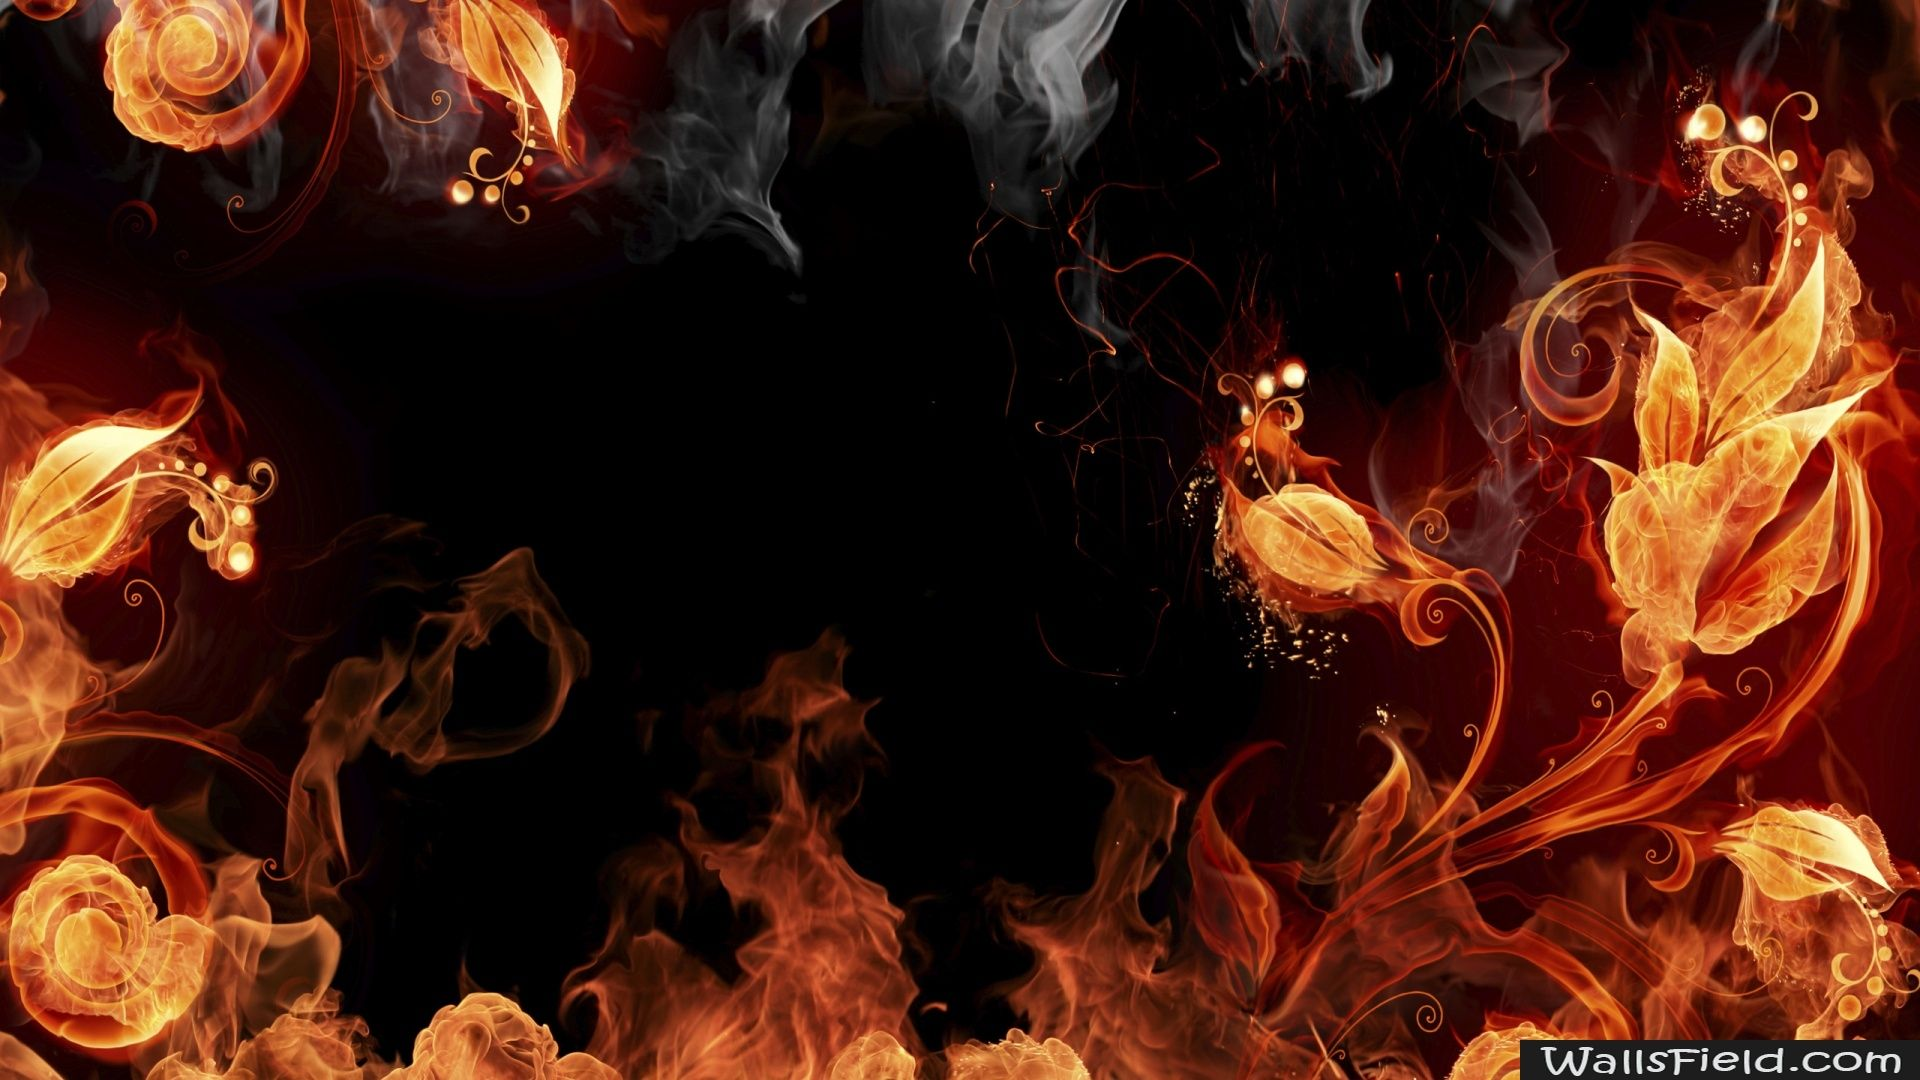 Artistic Fire Elemental Smoke Wallpaper Fire Art